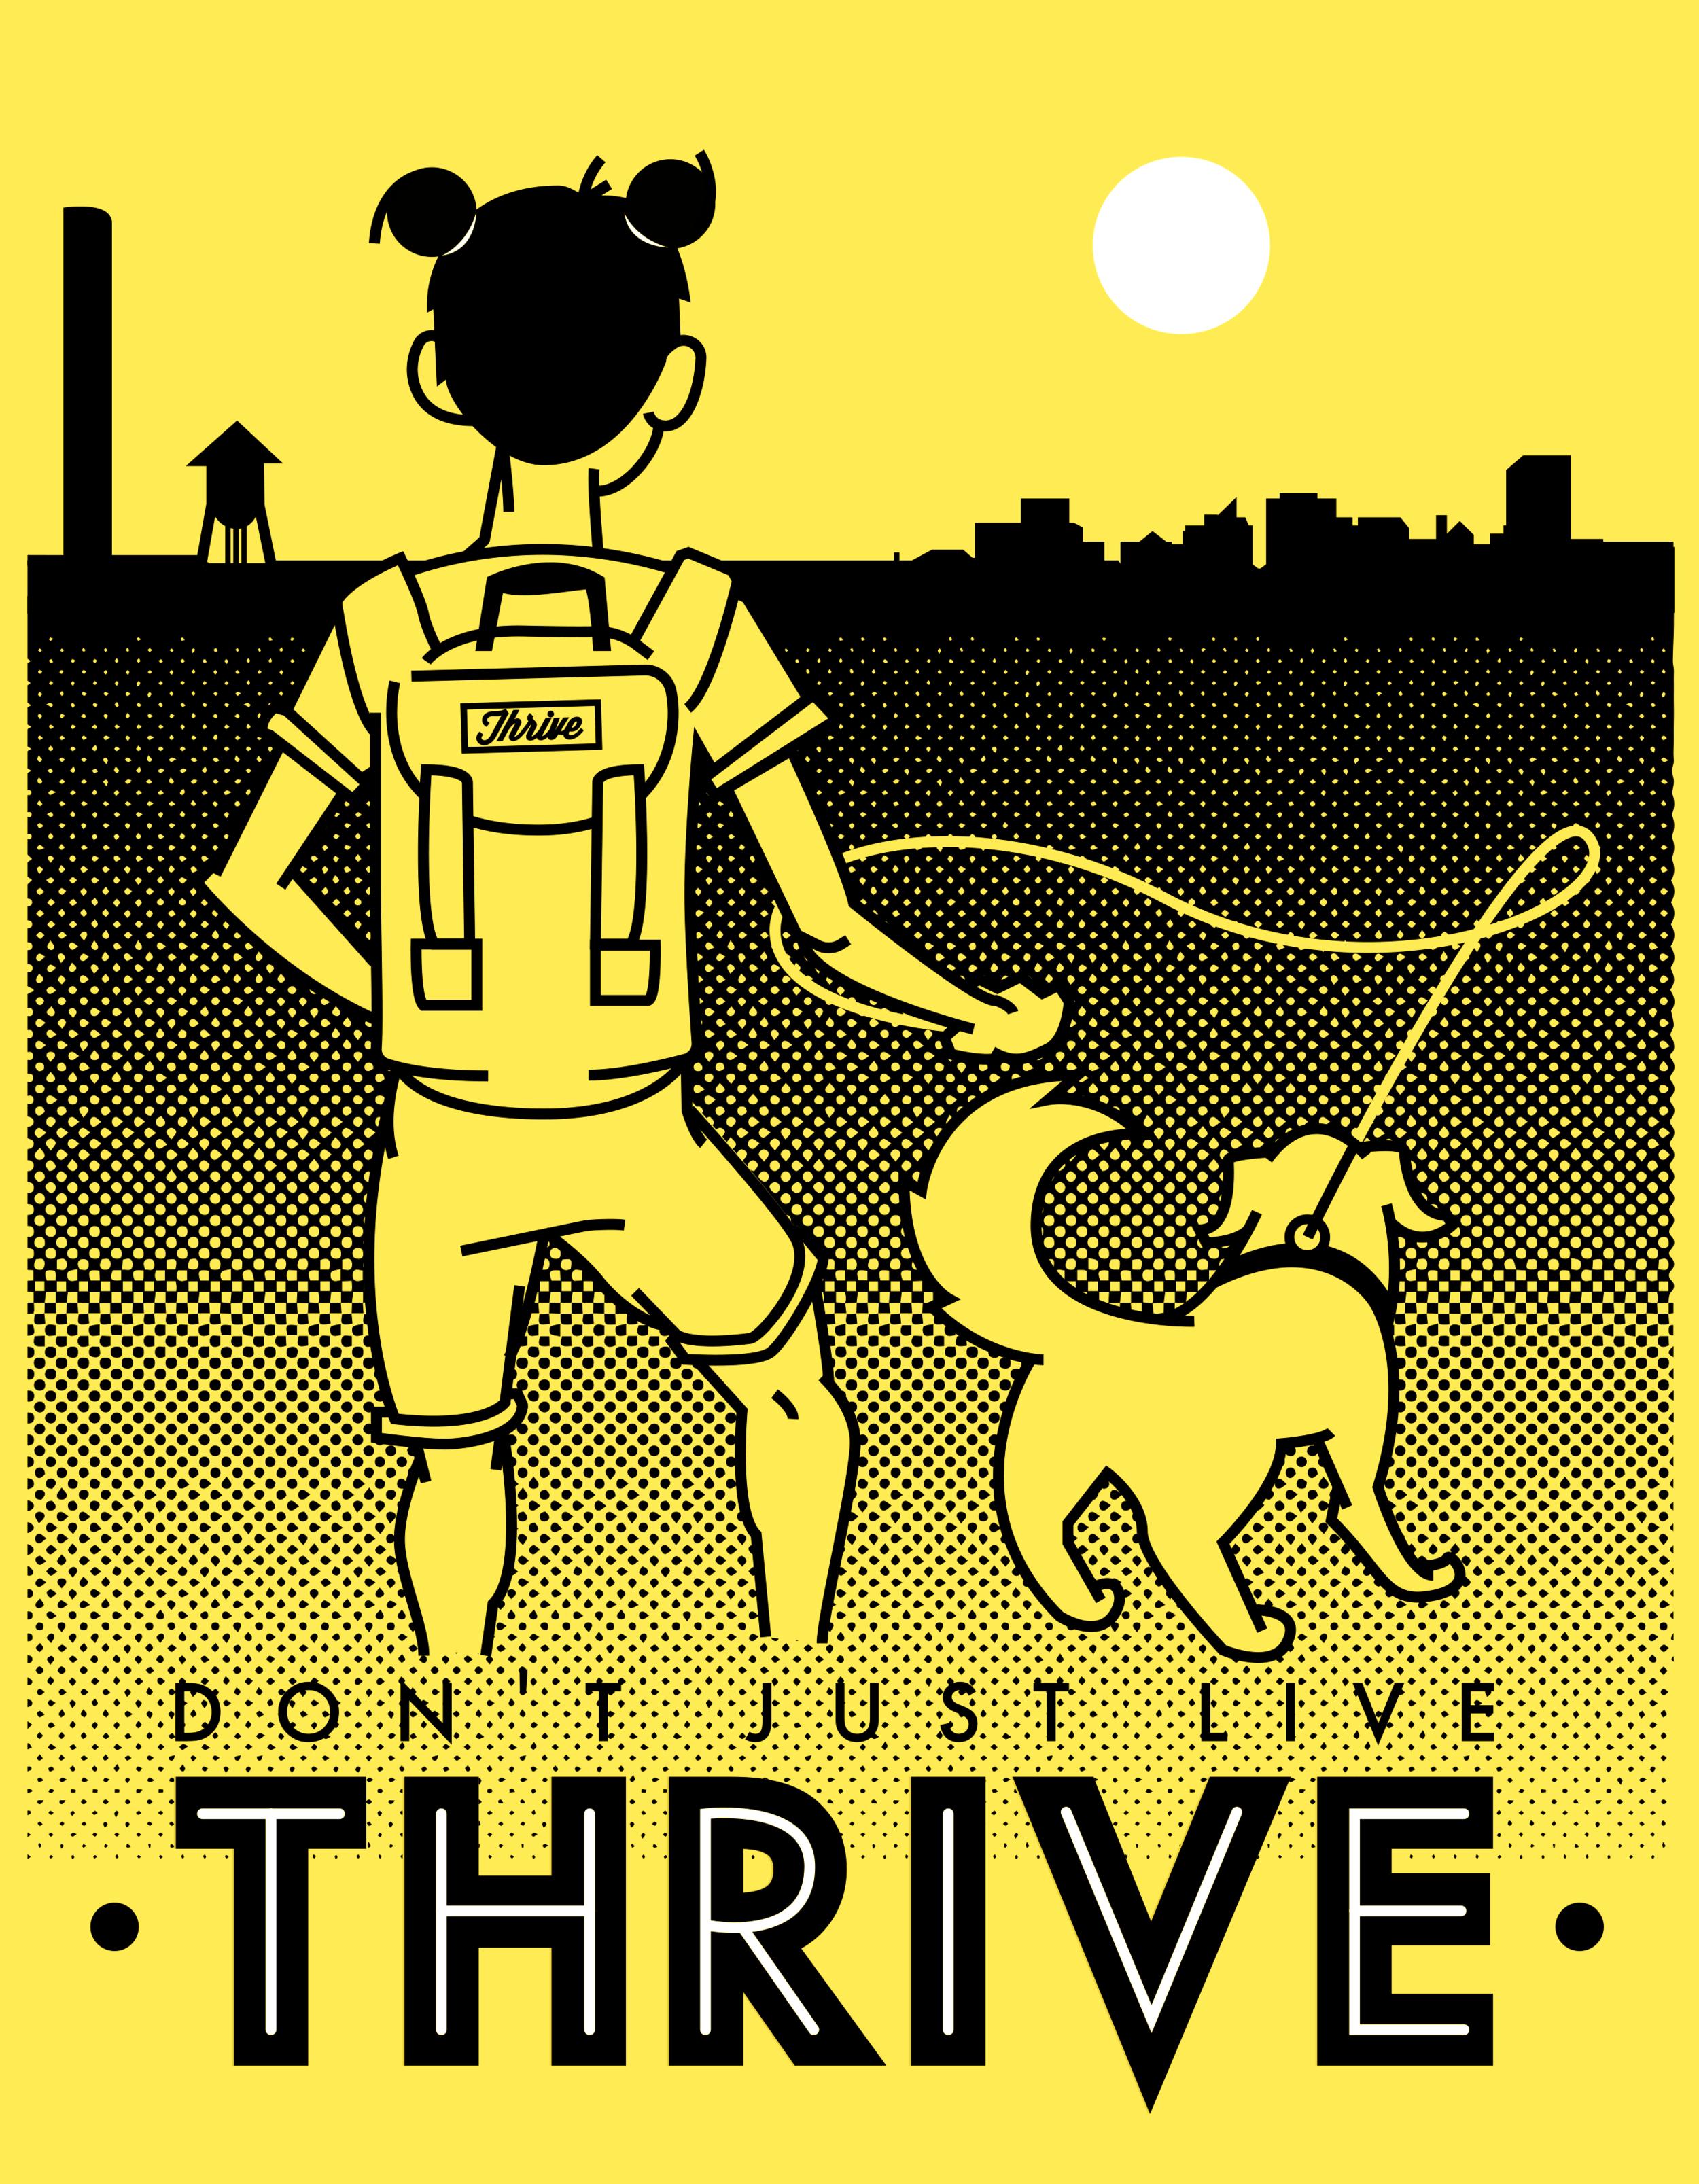 THRIVEshirt.png